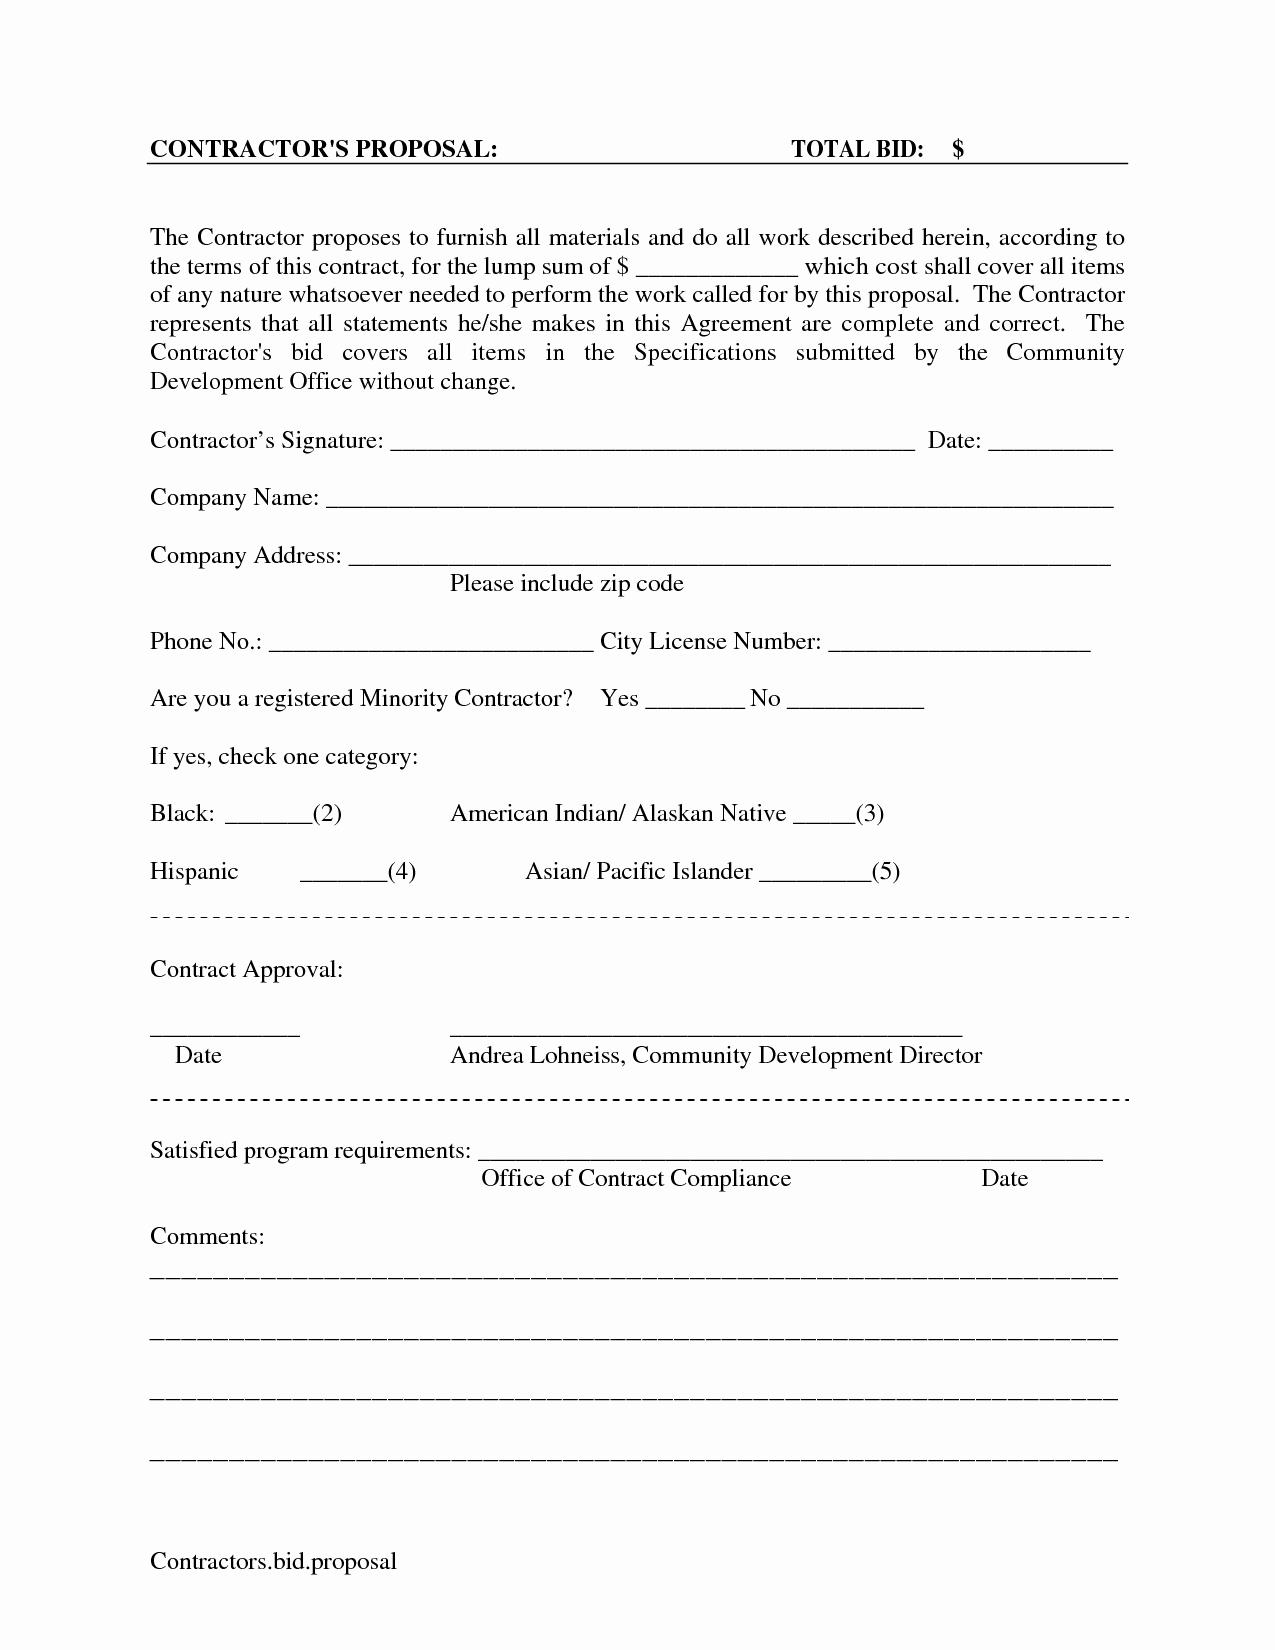 Landscaping Scope Of Work Template Beautiful Printable Blank Bid Proposal forms